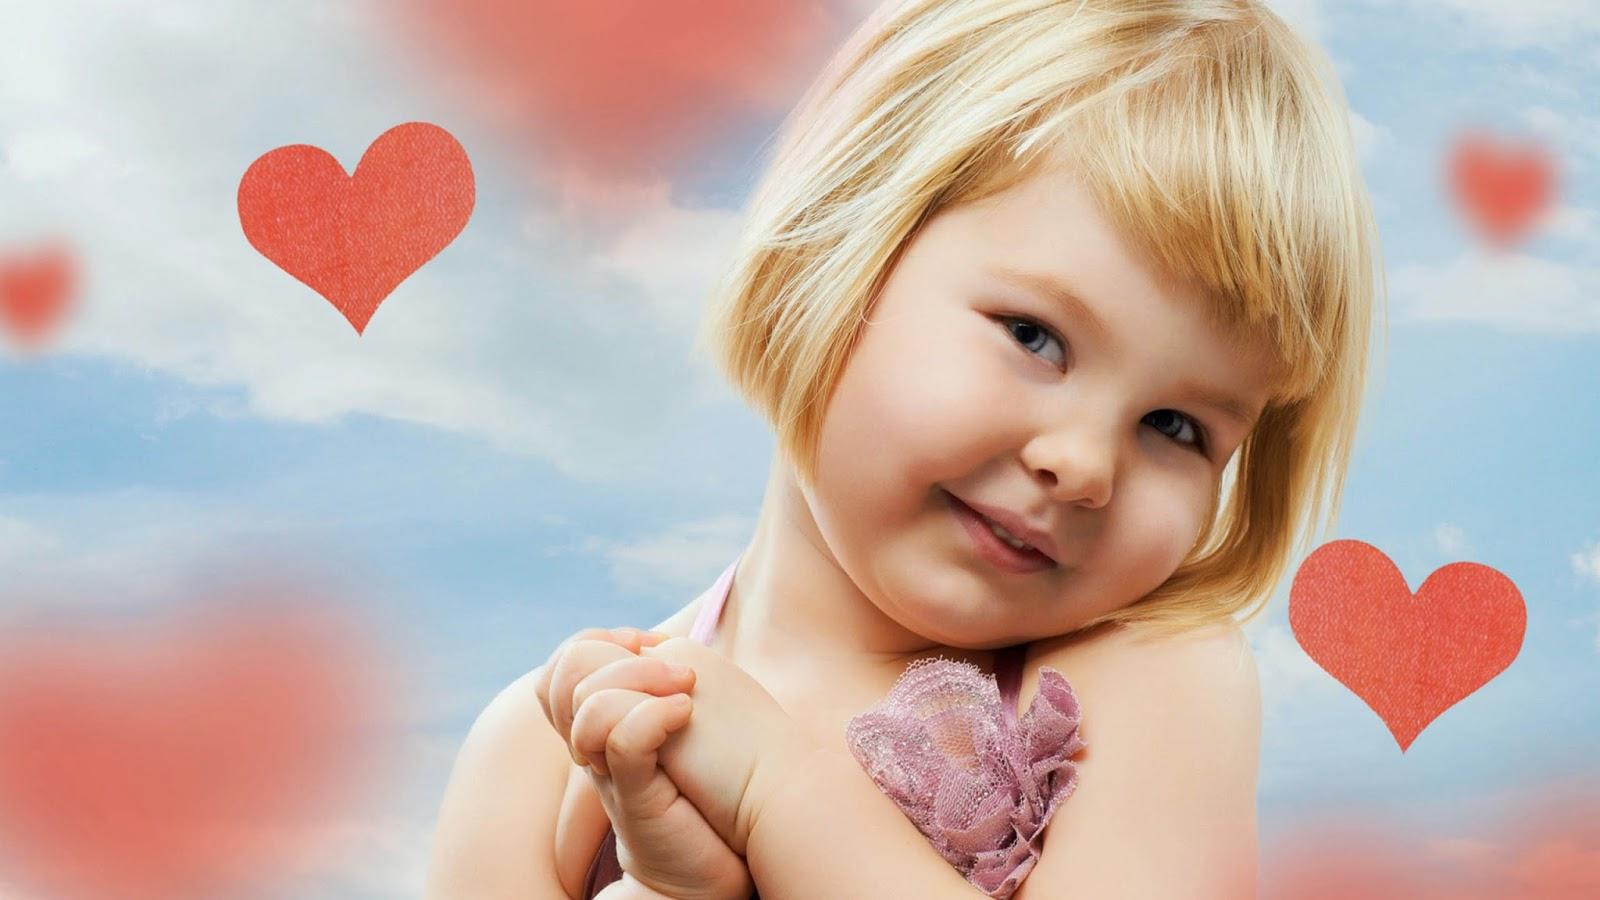 Windows 8 Hd Wallpapers Cute Kids Wallpapers Episode 4